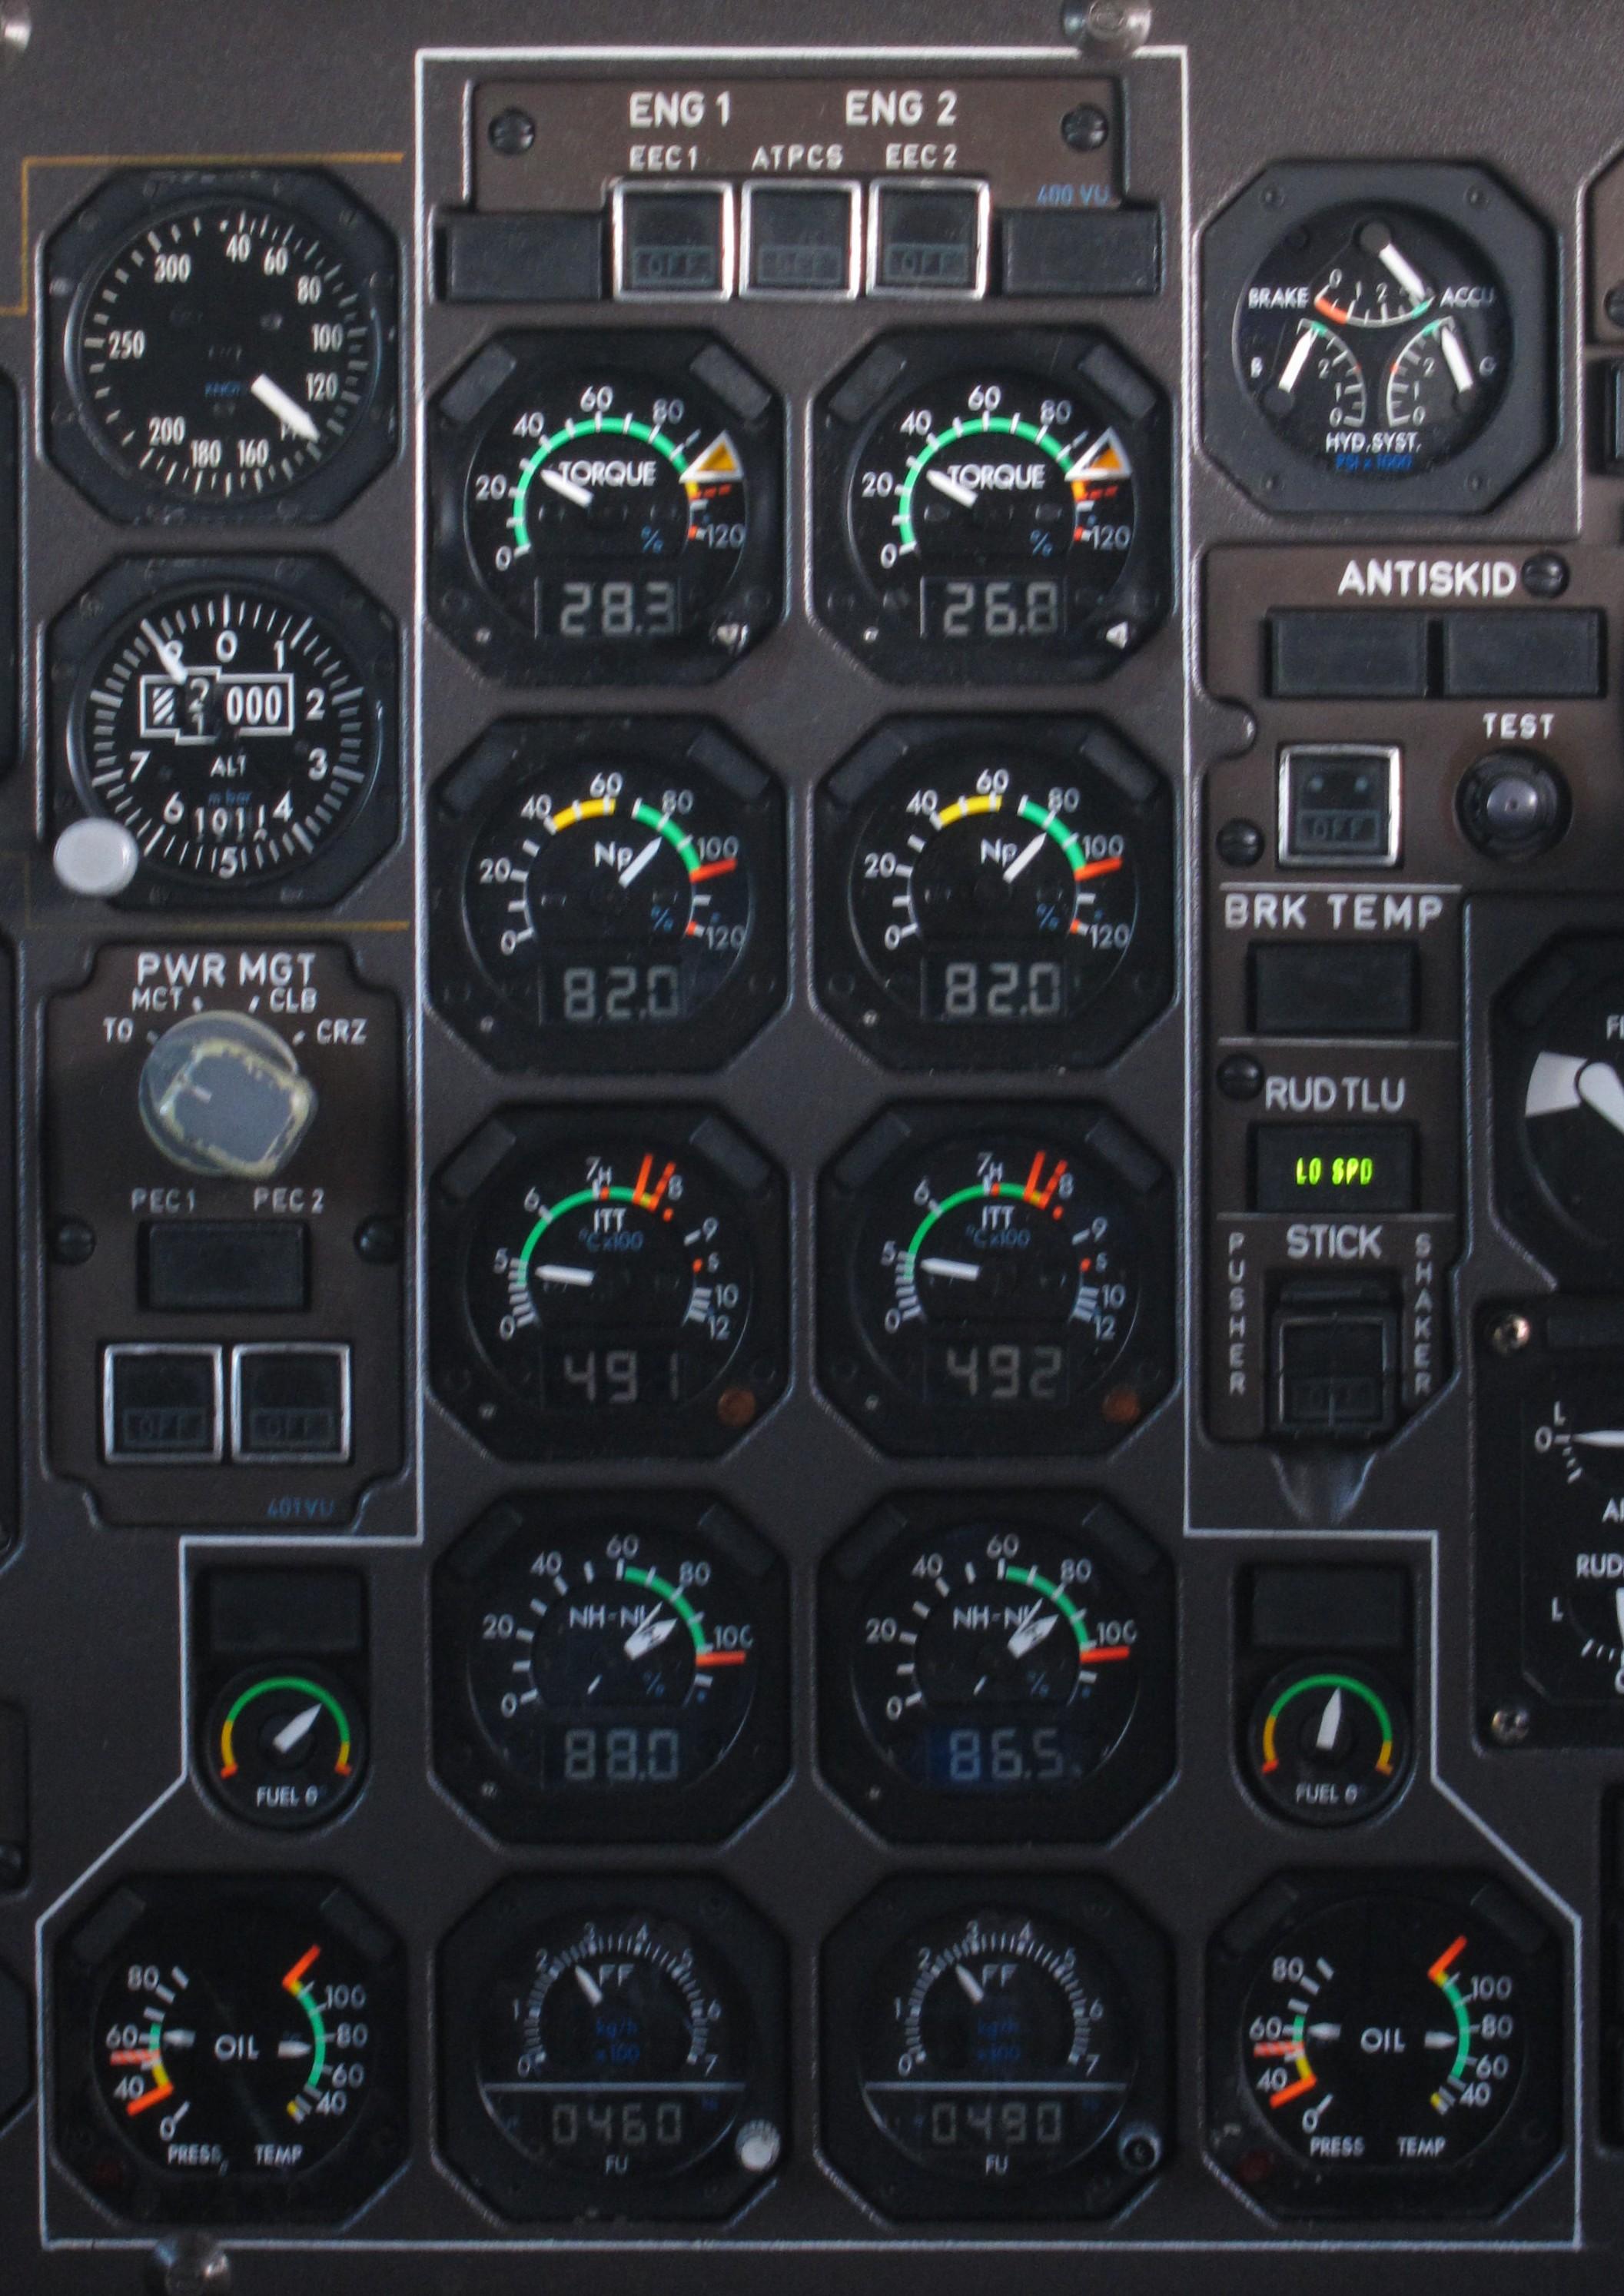 Cockpit Instrument Panel : File engine instrument panel of an atr cockpit g